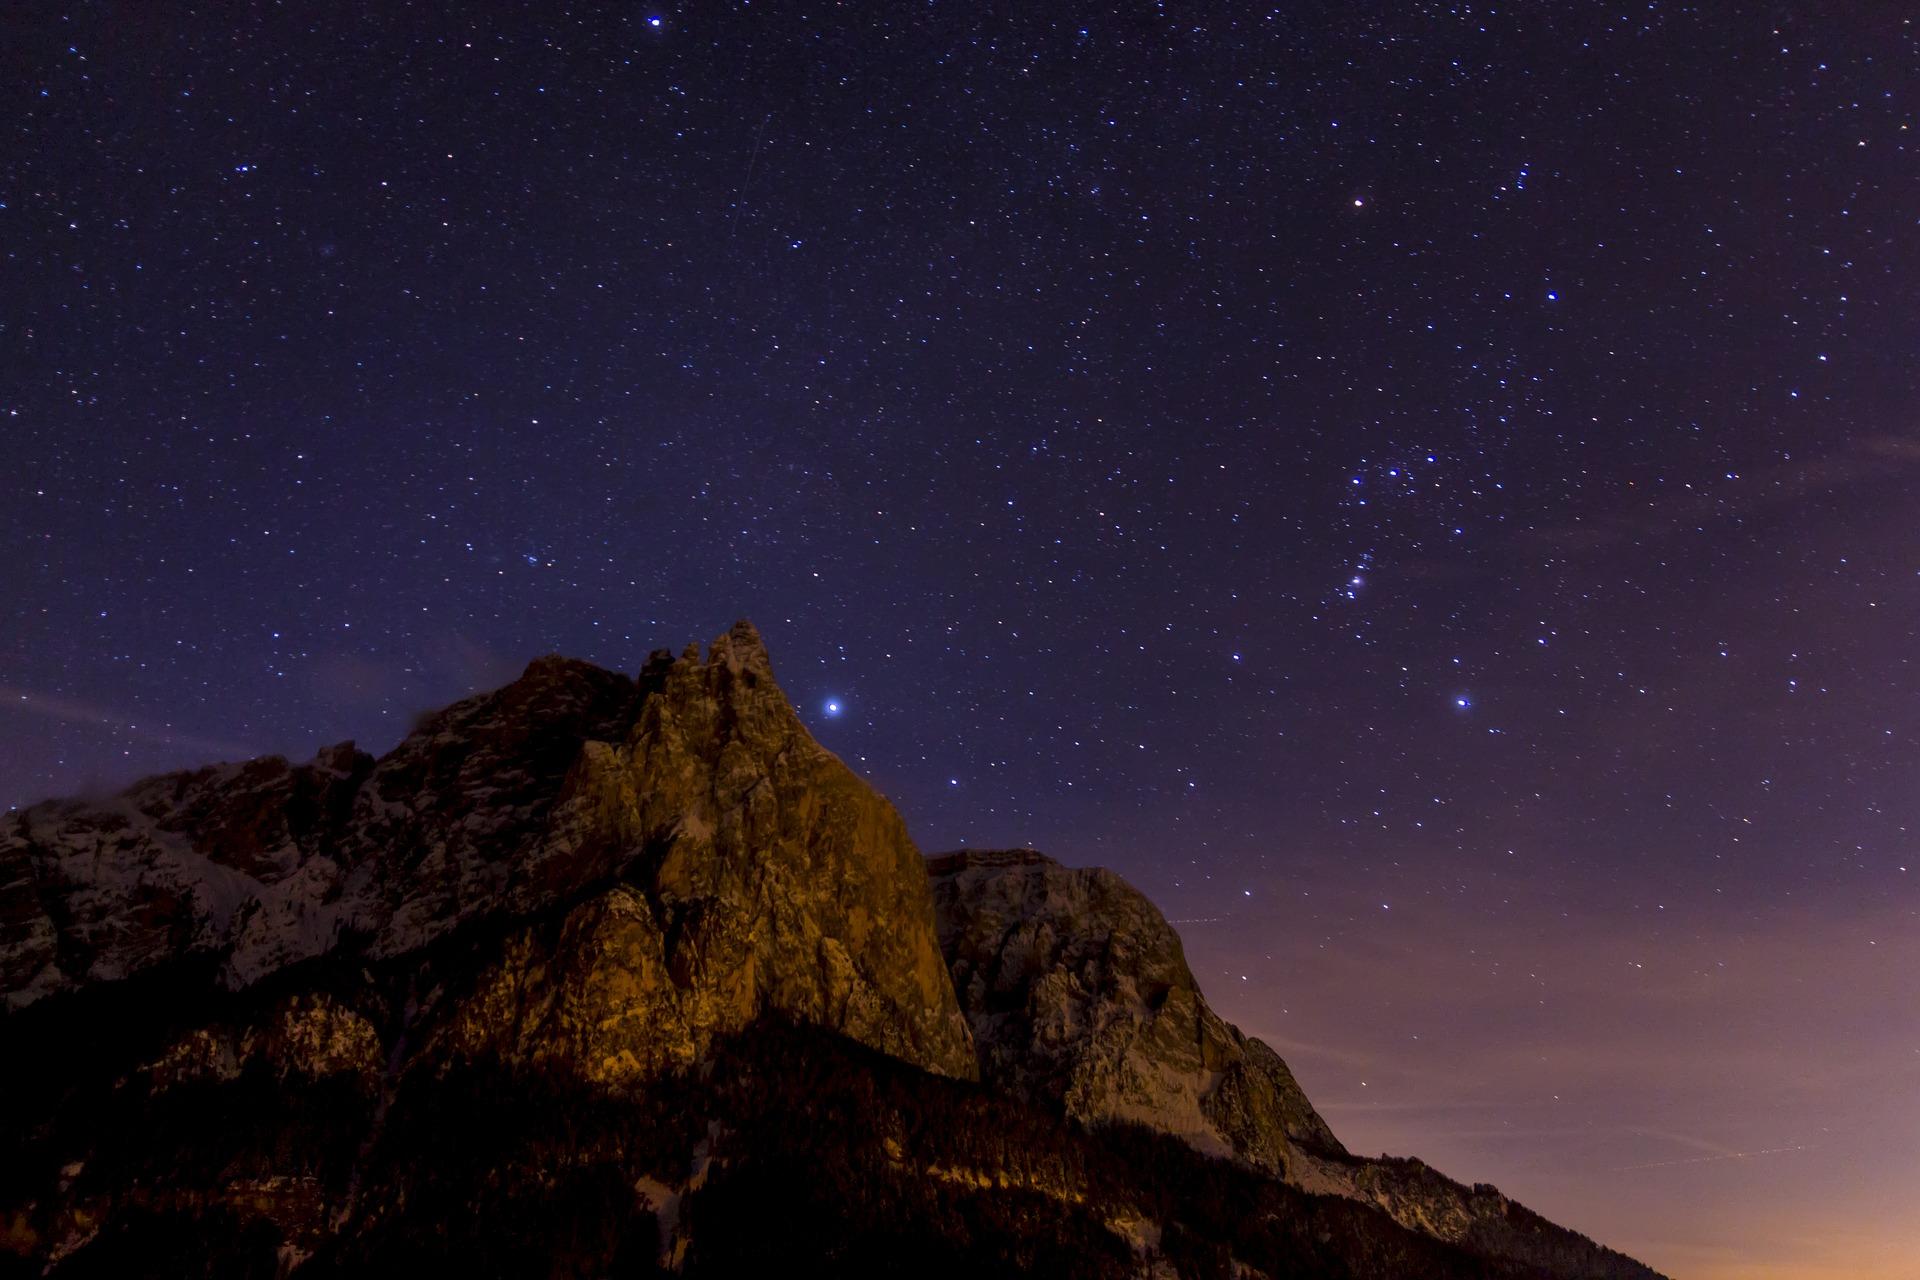 night-photograph-3210889_1920.jpg